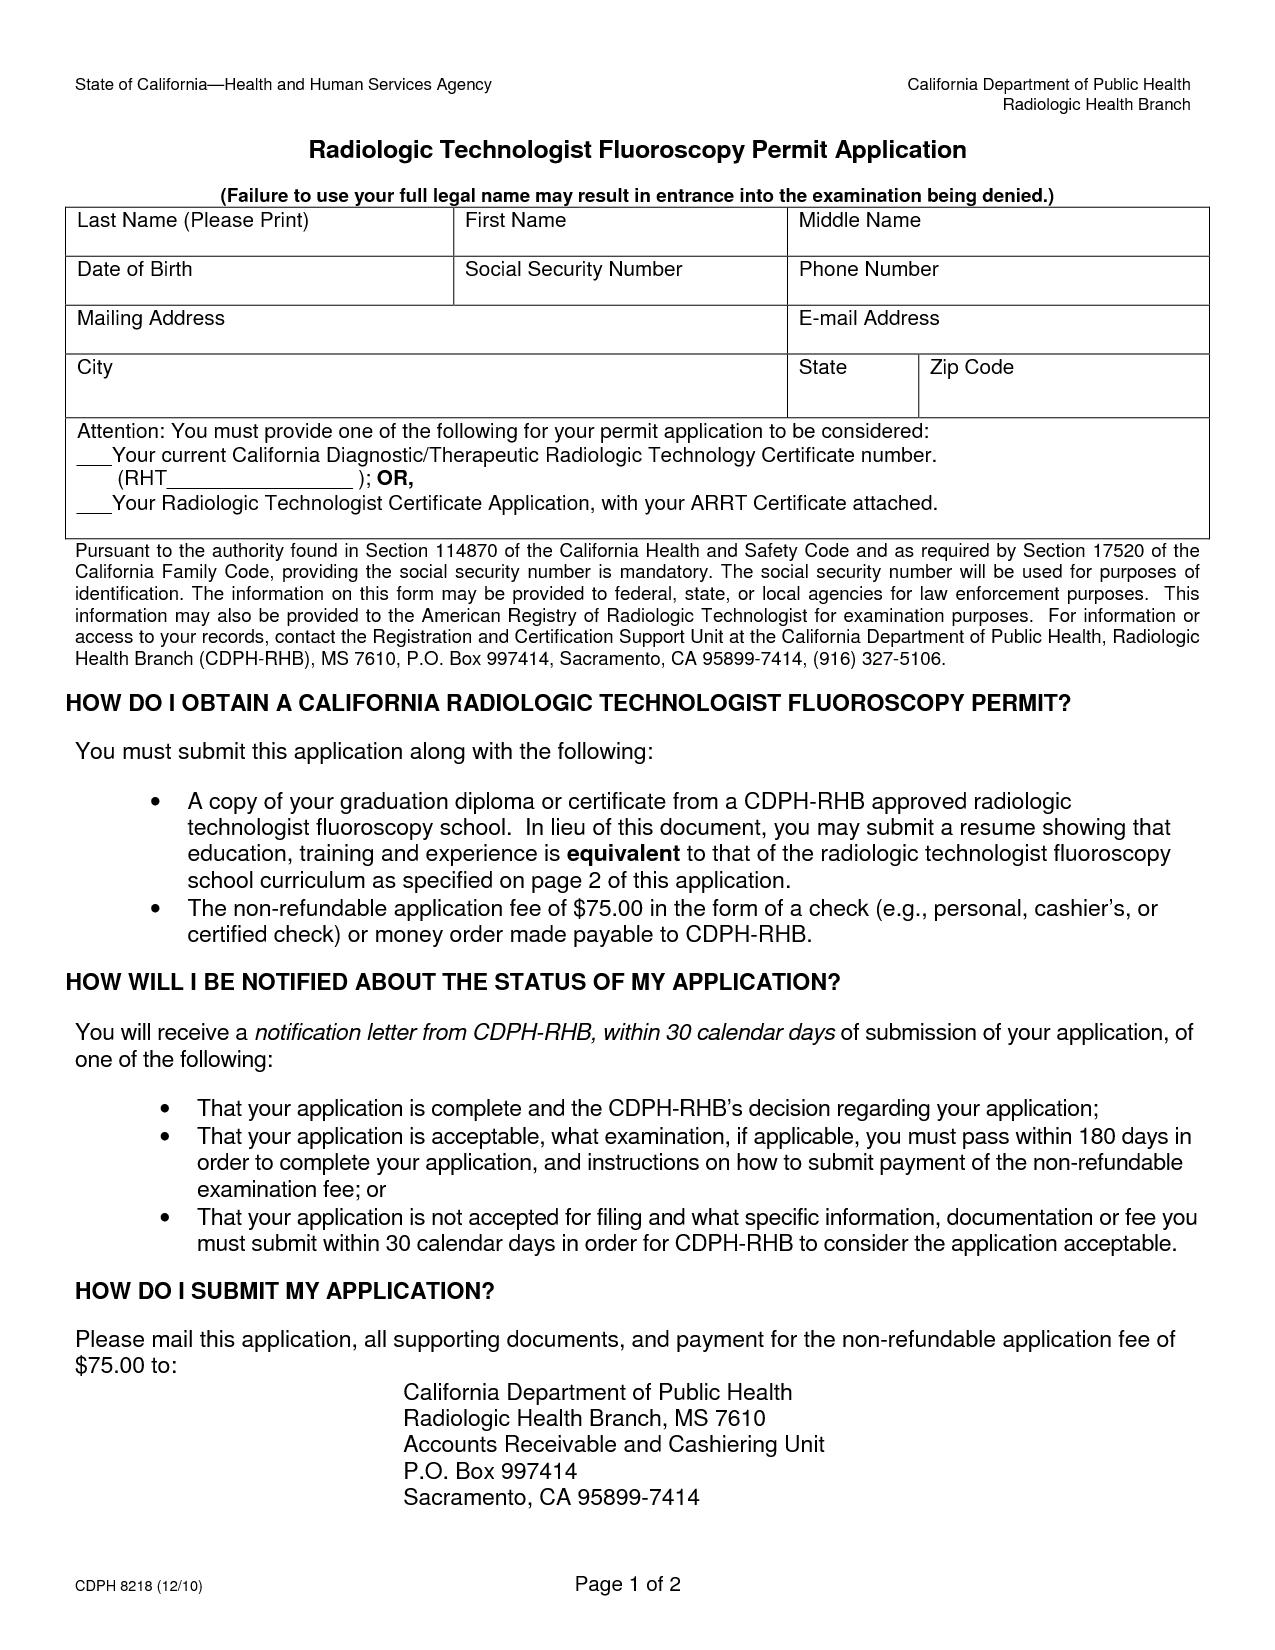 X Ray Technician Resume Format Resume Templates Radiology Technologist Xray Technician Radiology Technician